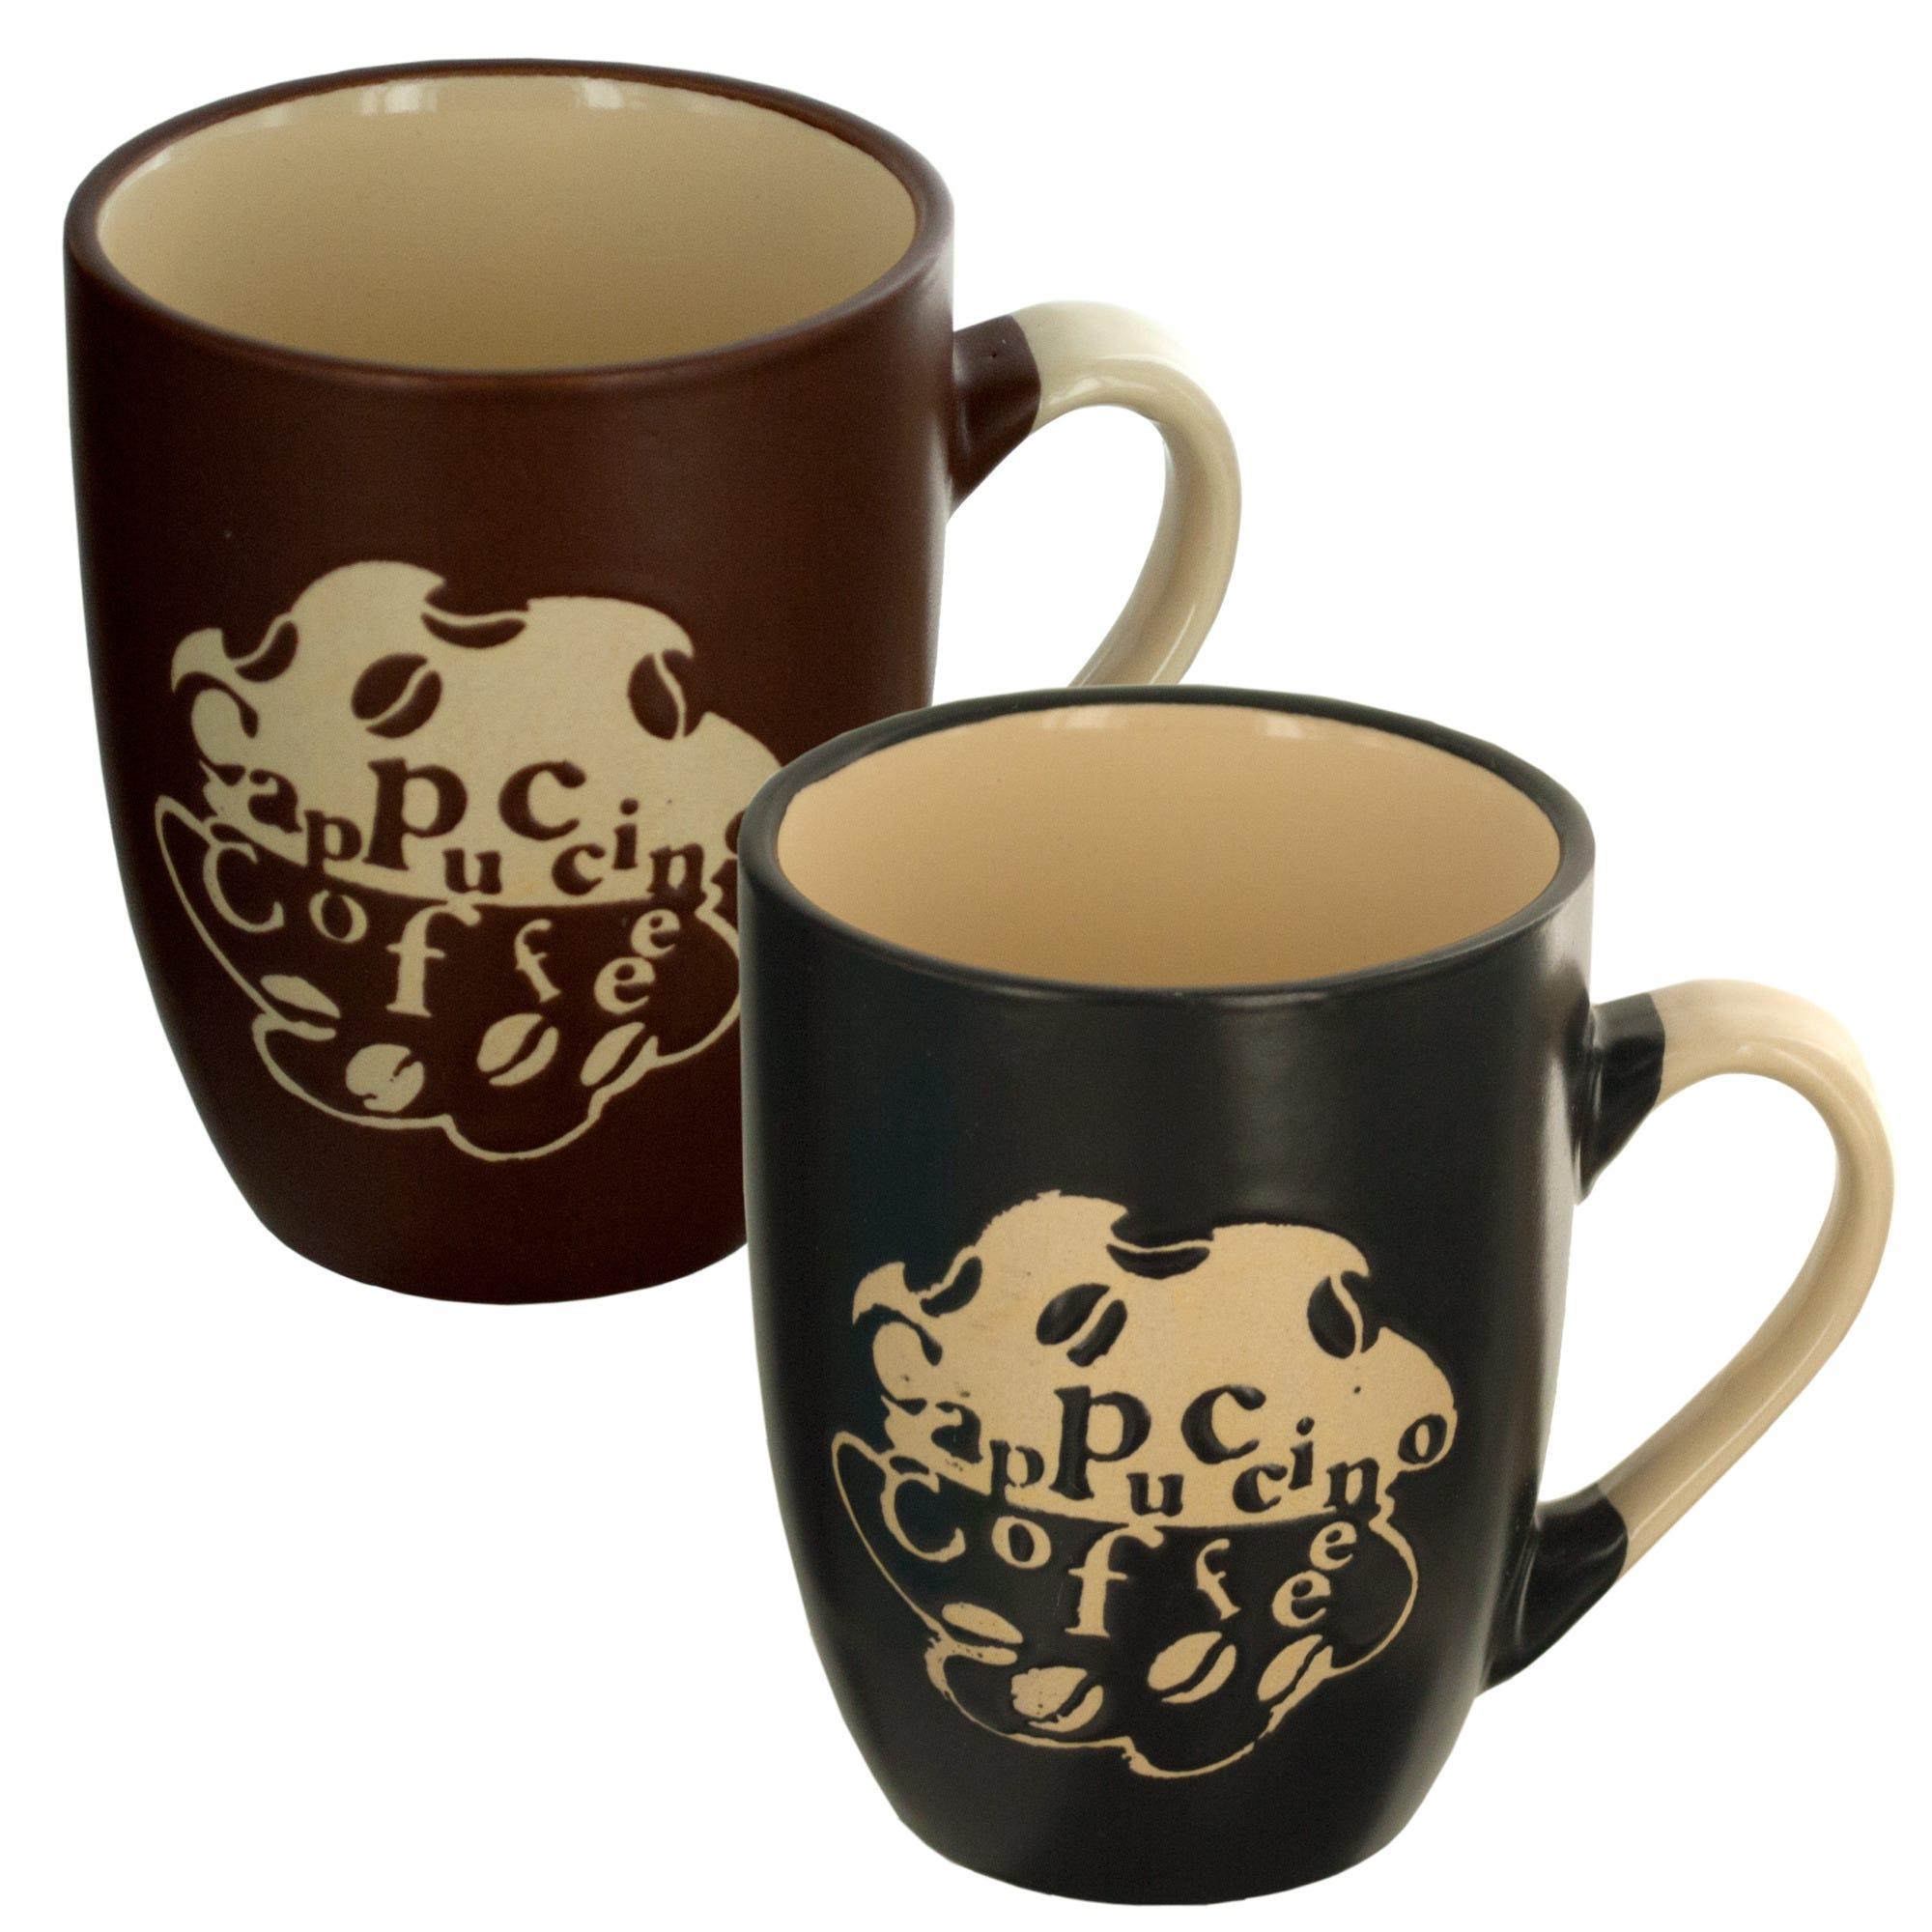 cappuccino-ceramic-COFFEE-mug